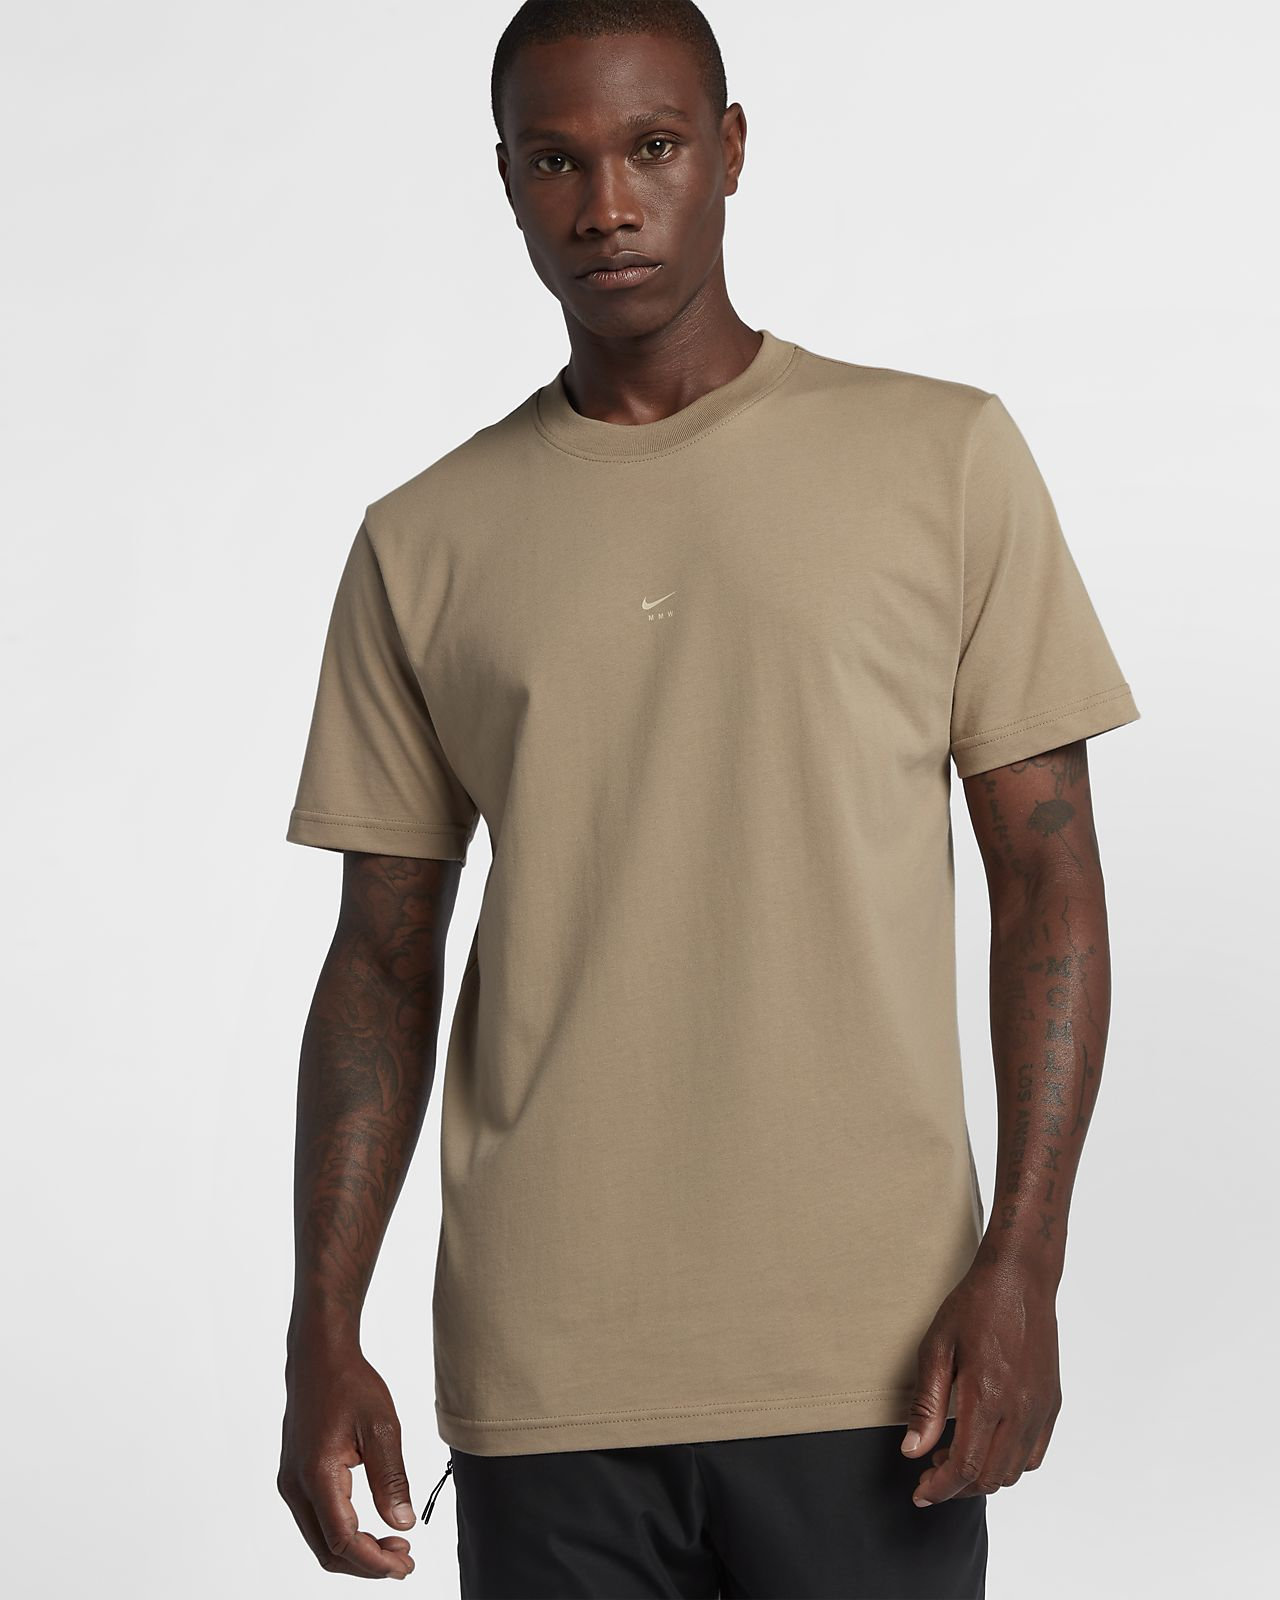 Nike x MMW Graphic Men's T-Shirt